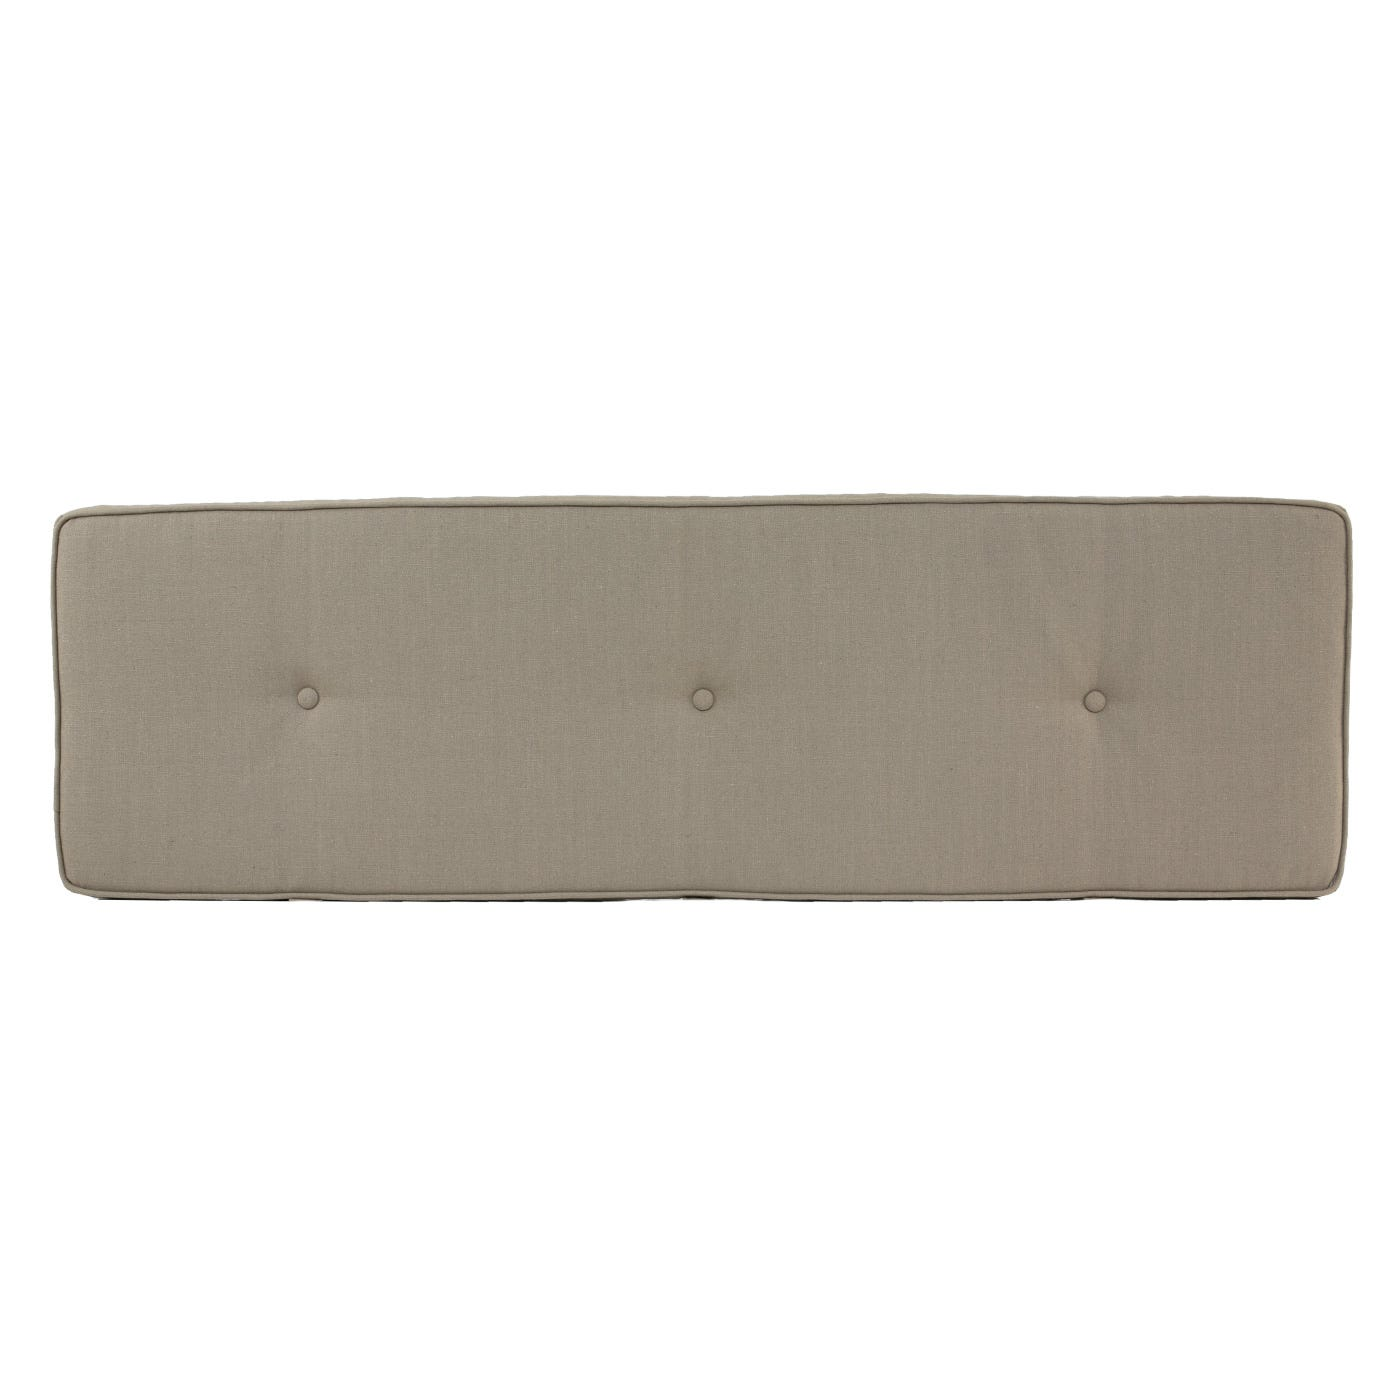 Brunel Bench Cushion Wheat Beige Fabric